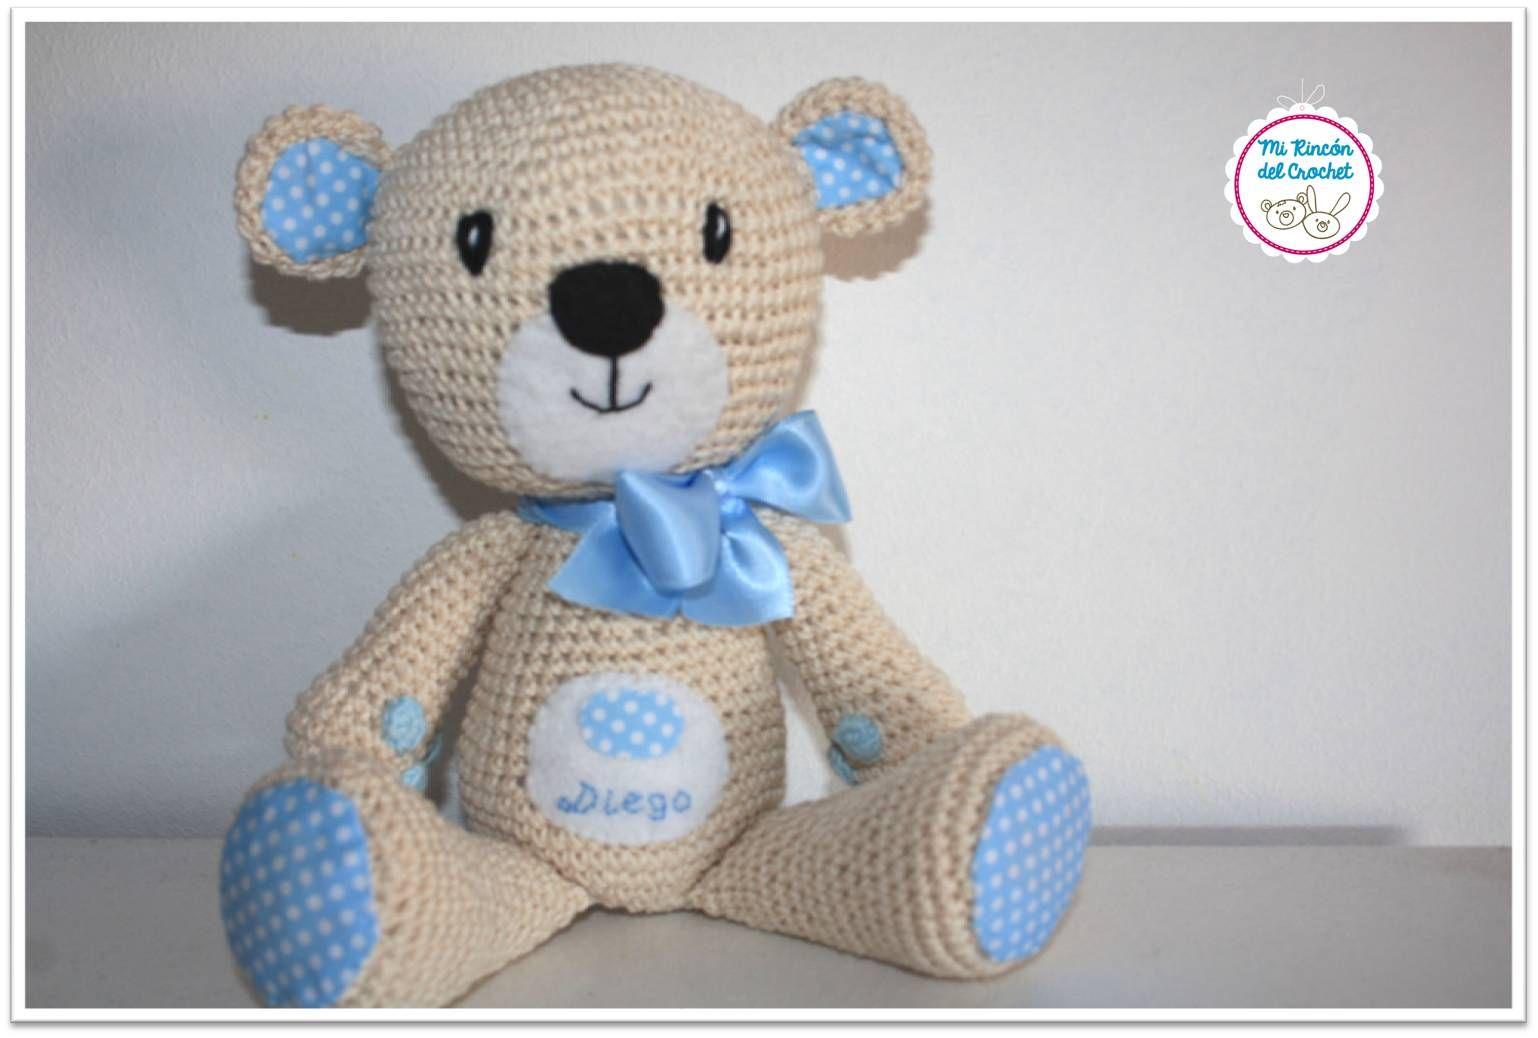 muneco-de-oso-tejido-a-crochet | tejidos | Pinterest | Crochet